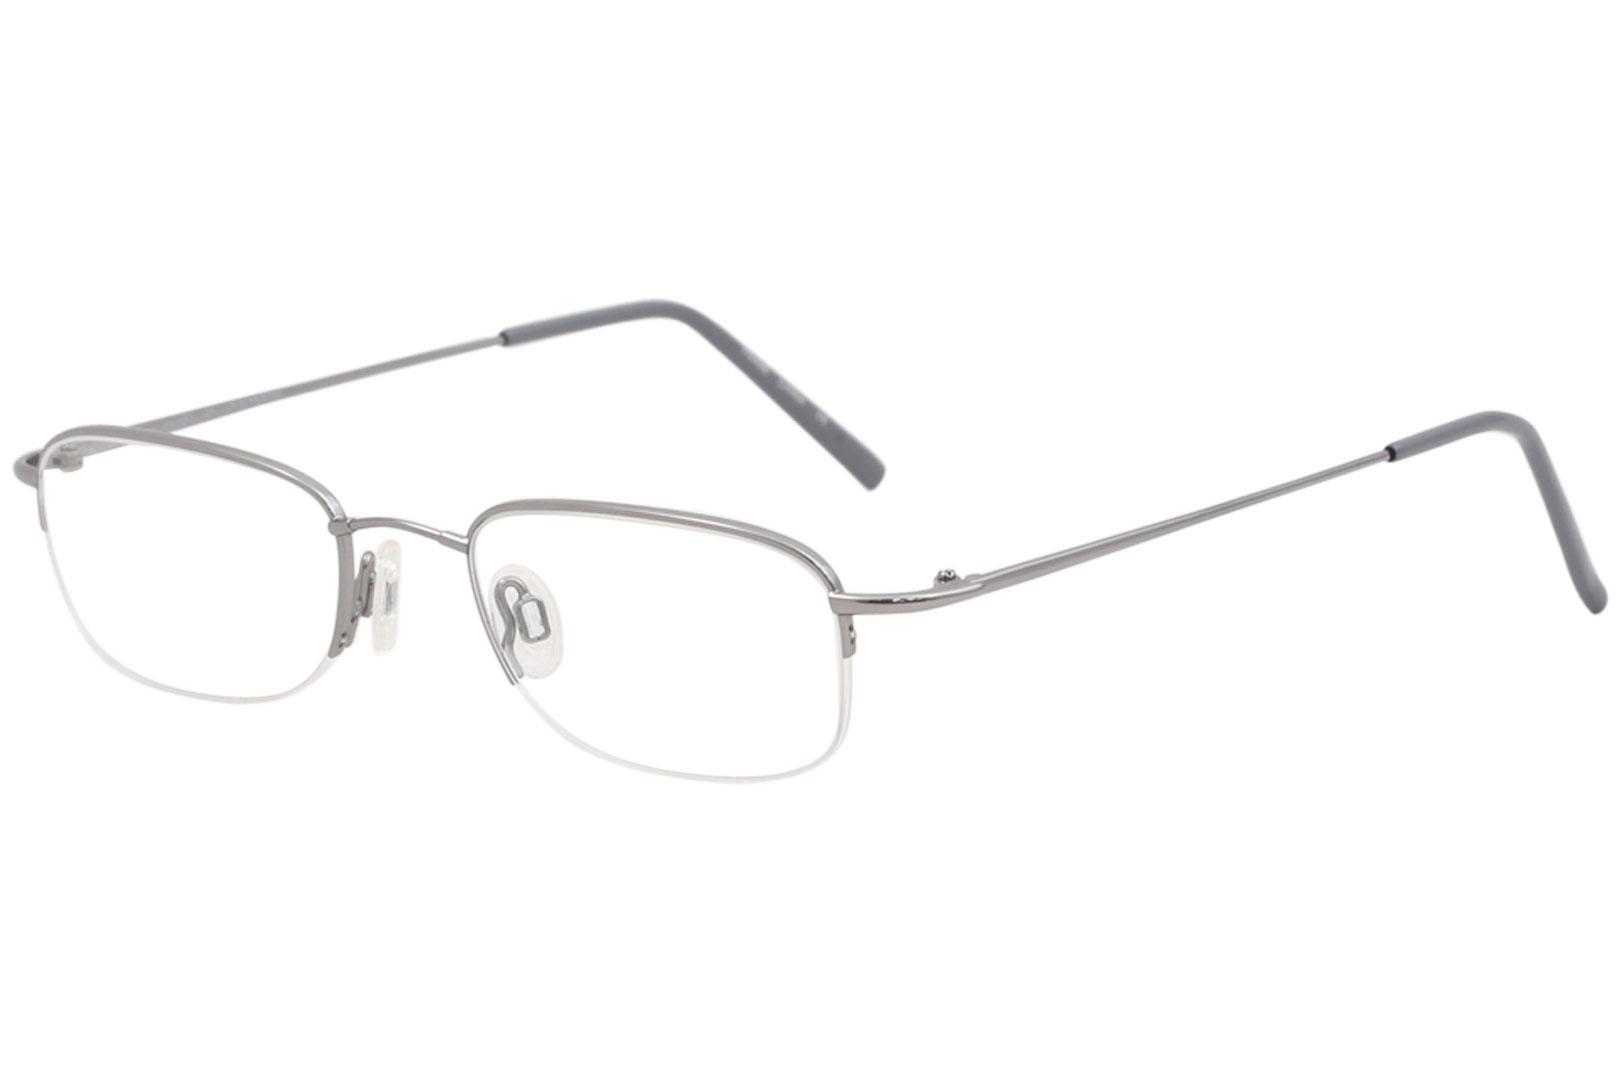 c202f8d57b4 Flexon Men s Eyeglasses 607 033 Light Gunmetal Half Rim Optical ...